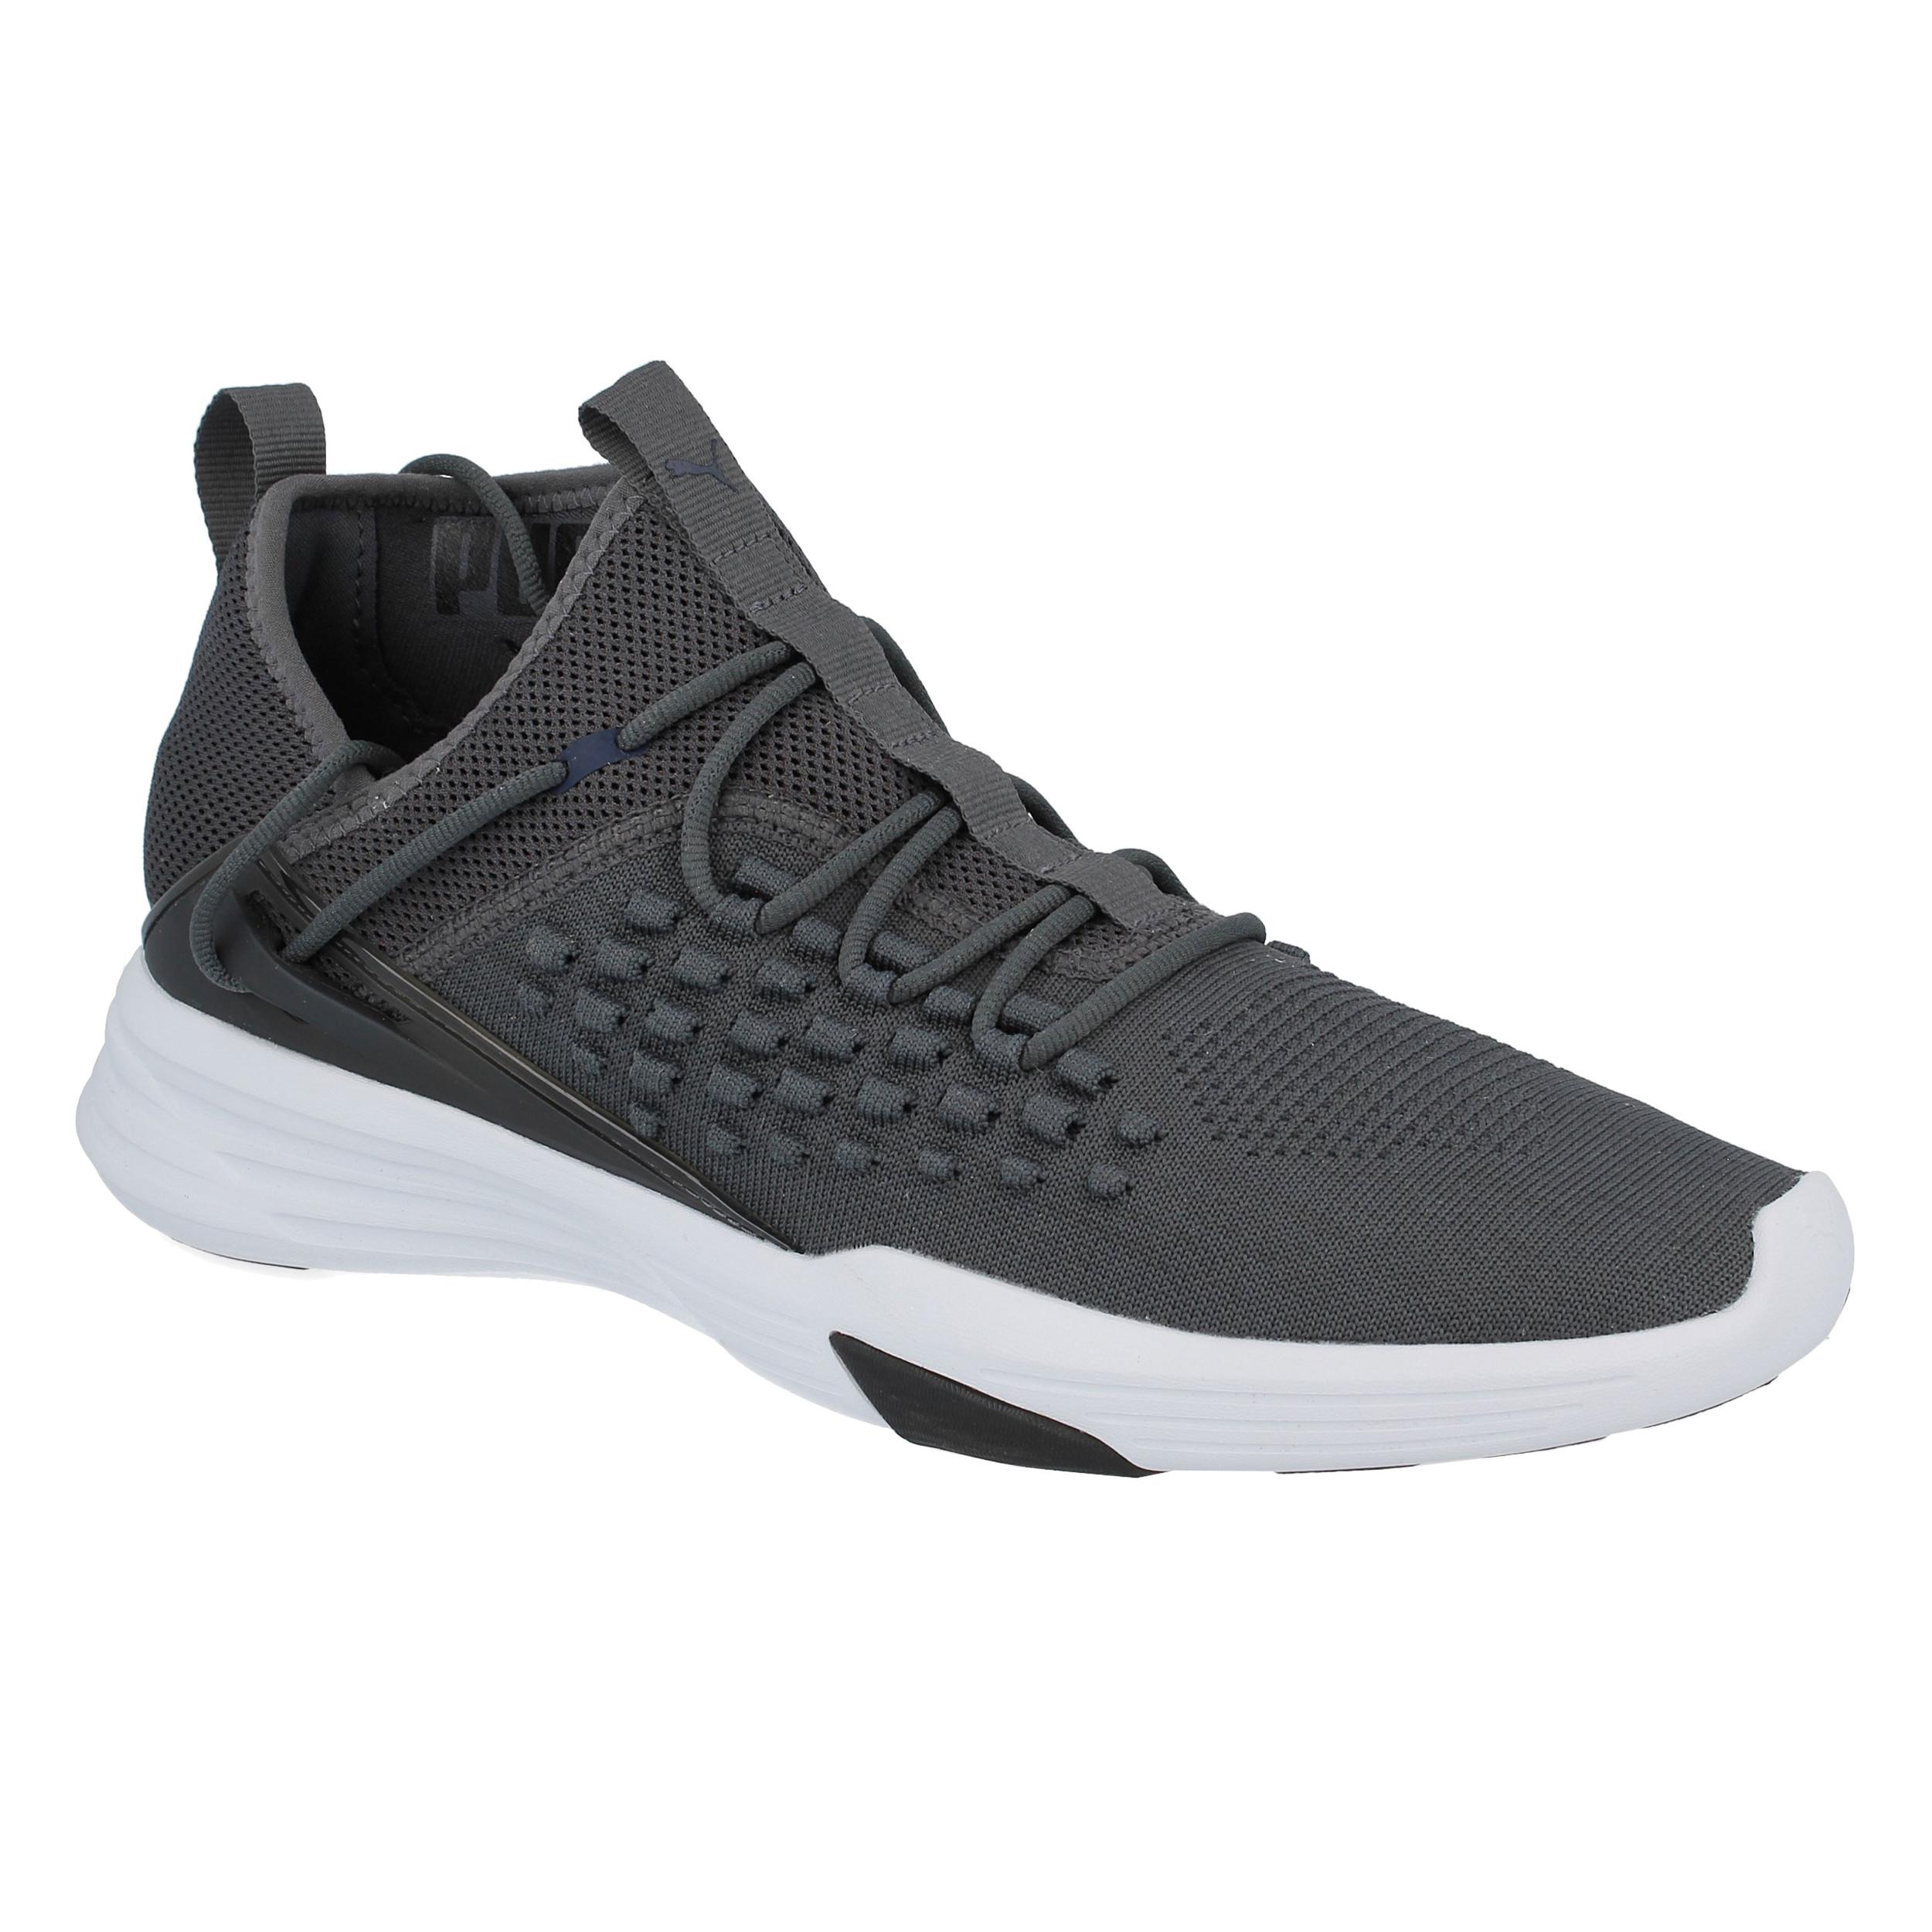 2b939b91765 Puma Mens Mantra Fusefit Training Gym Fitness Shoes Grey Breathable Trainers